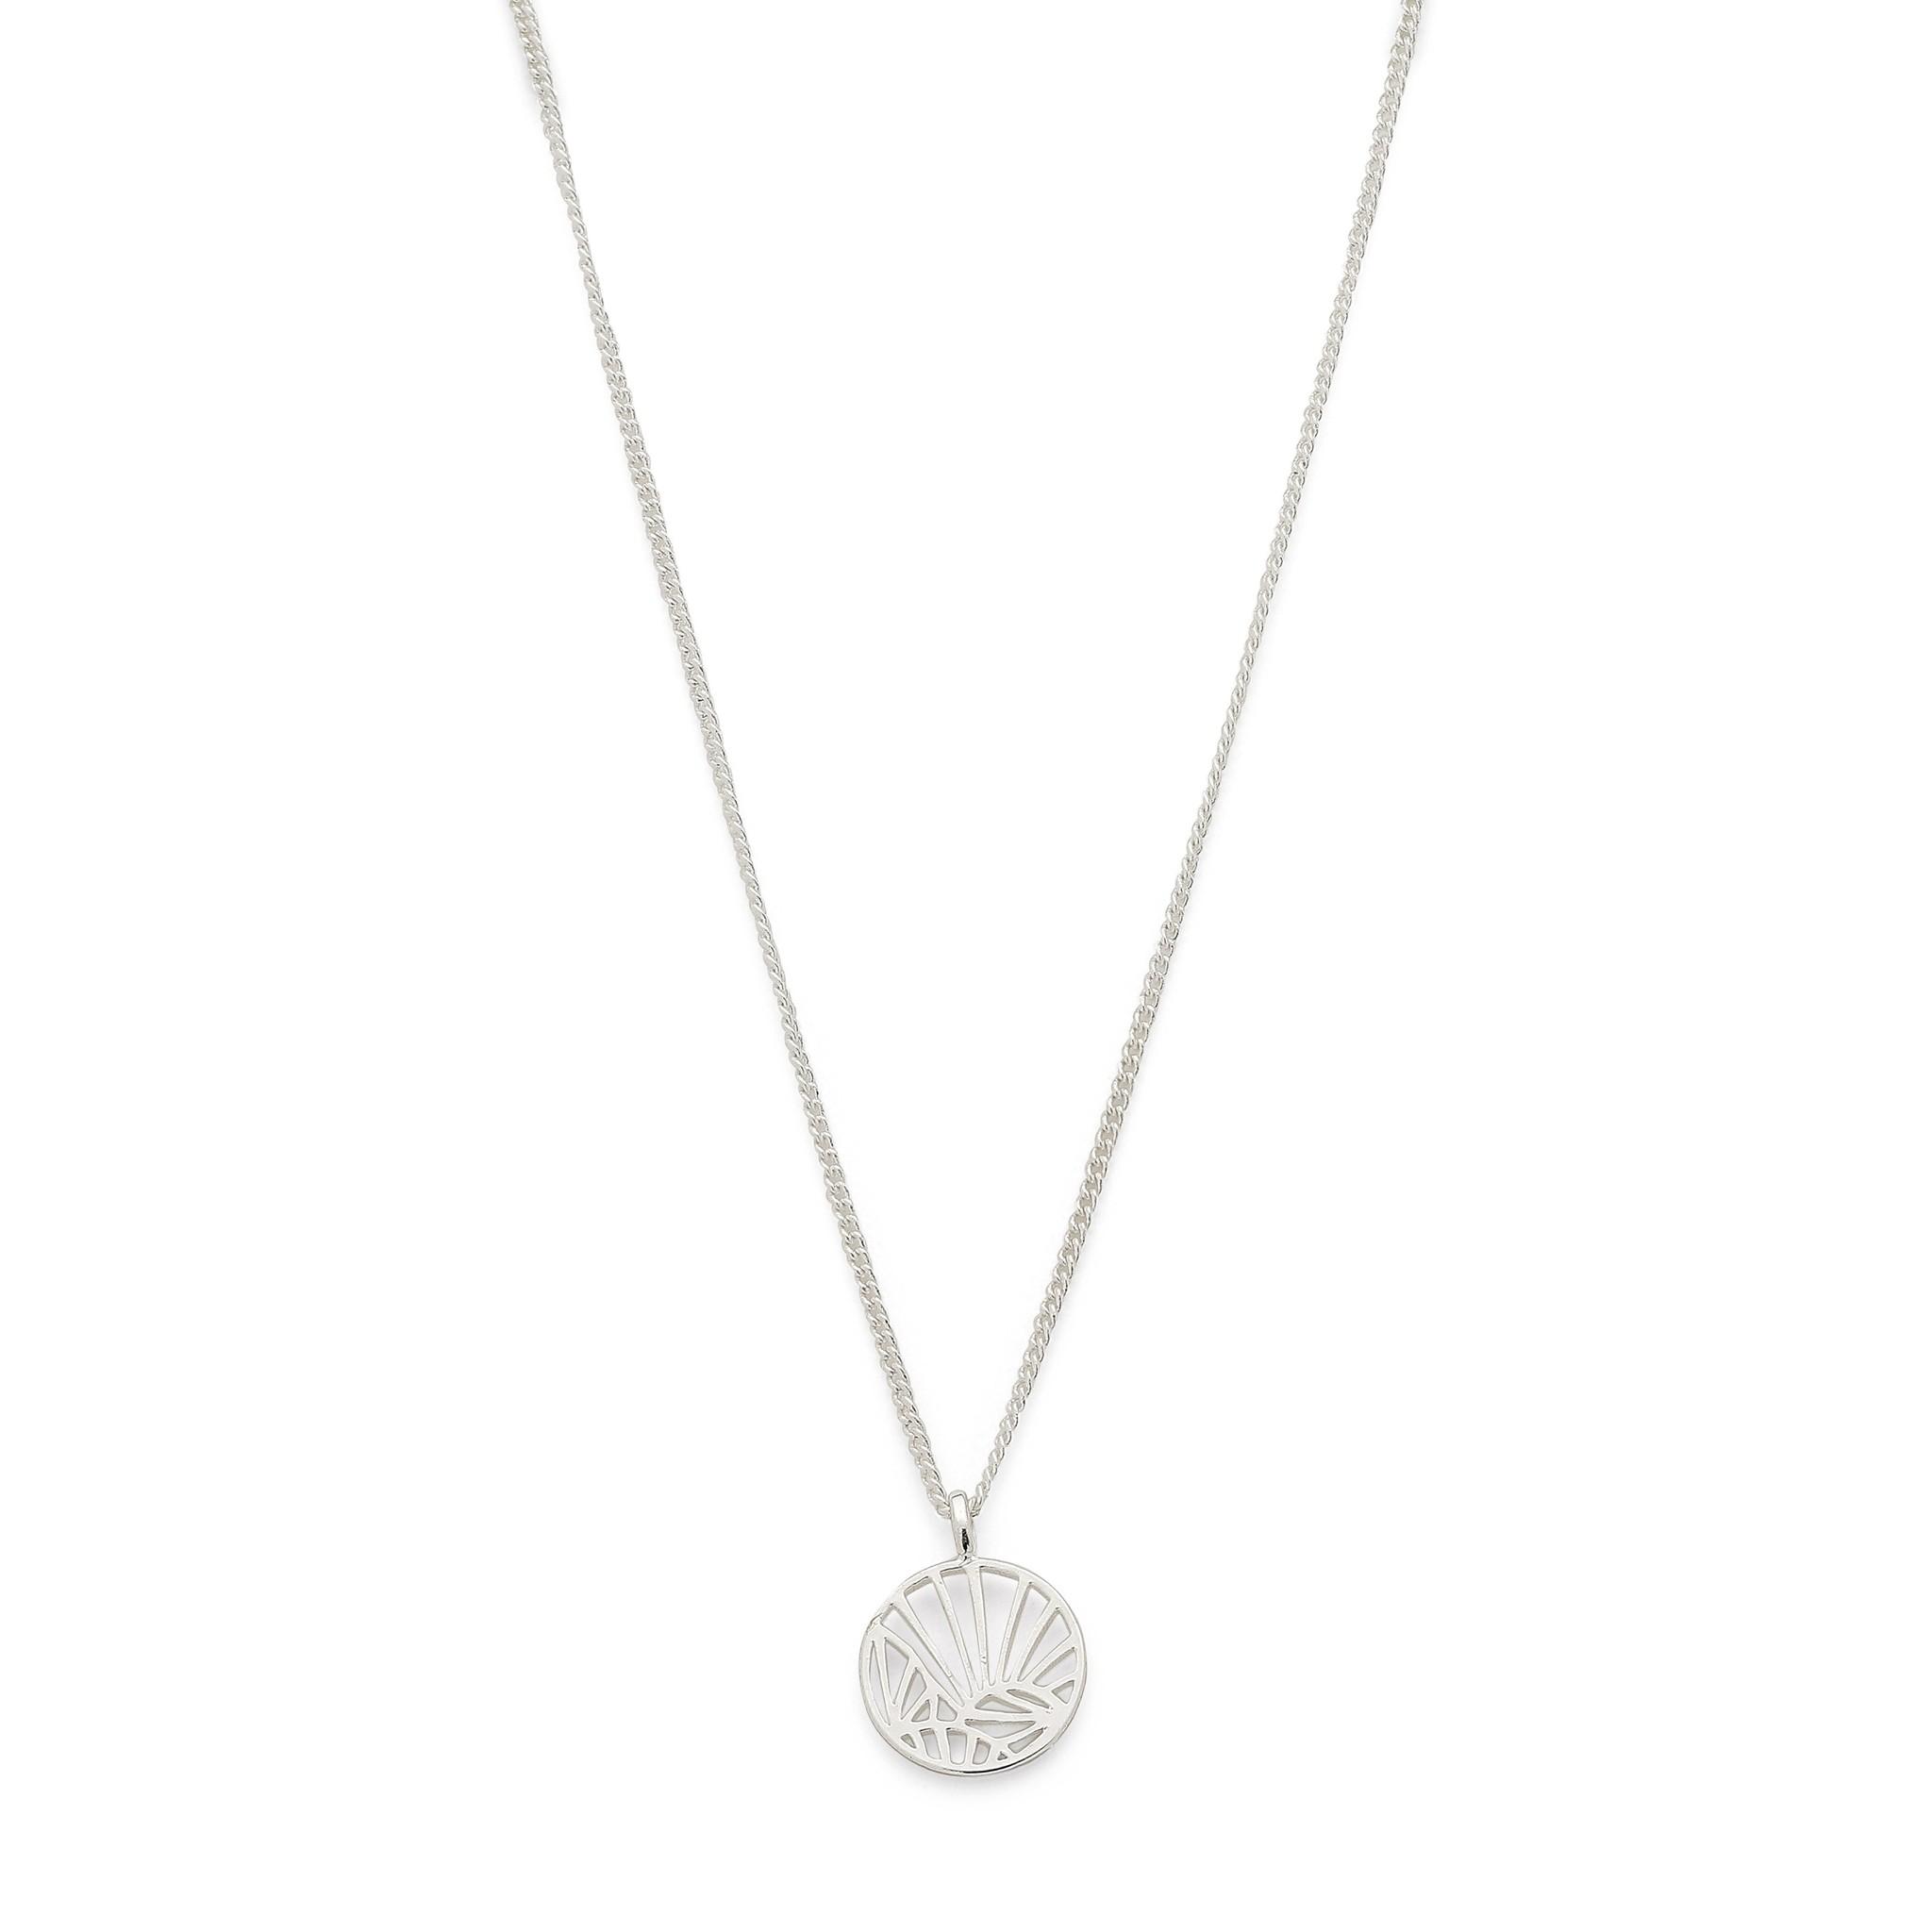 Pilgrim Pilgrim Asami Silver Necklace